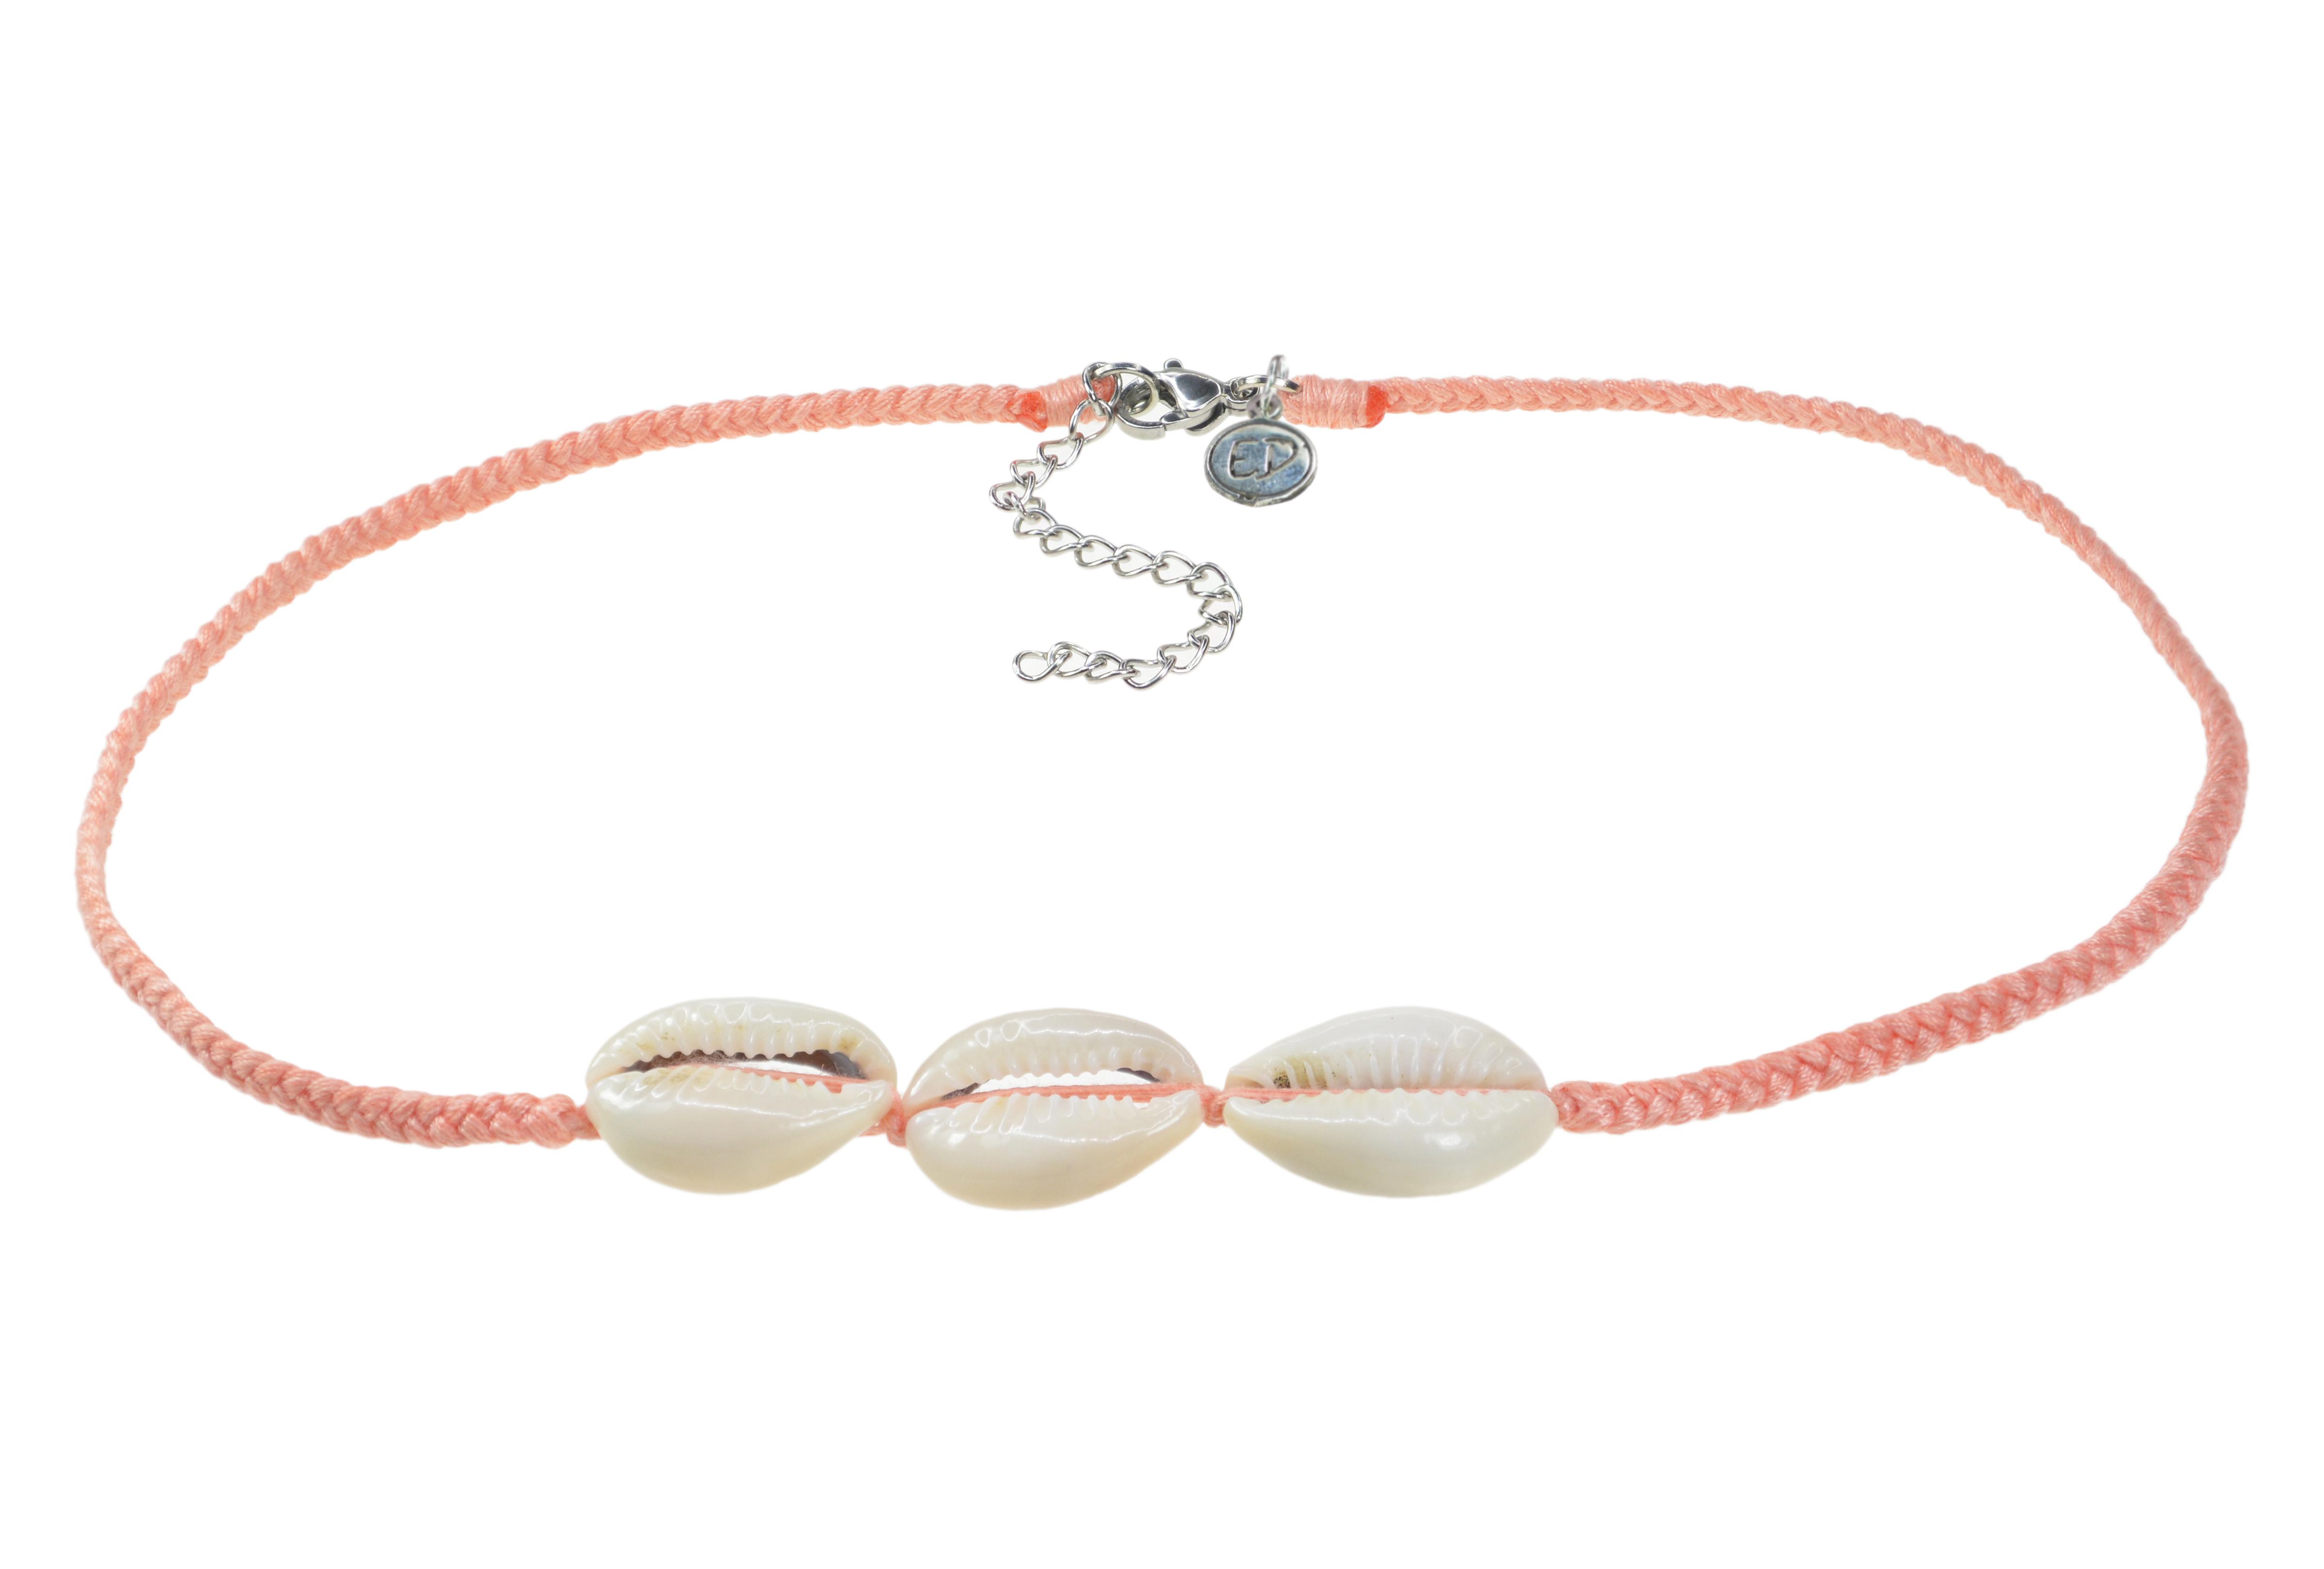 Dámsky ručne pletený náhrdelník  s tromi mušľami - Cantaloupe